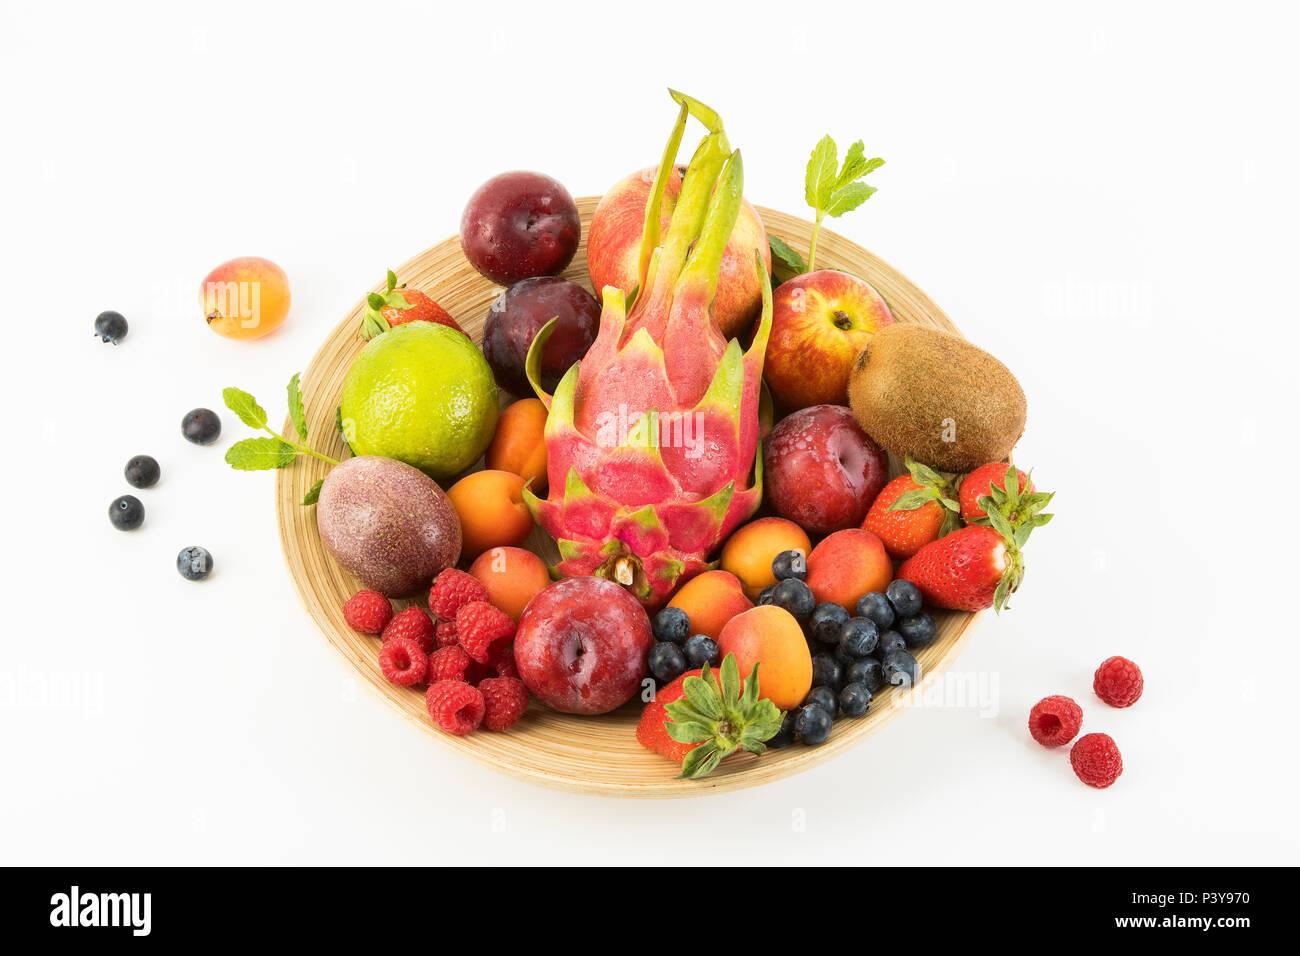 Obst, Früchte-Mix, Erdbeeren, Himbeeren, Blaubeeren, Äpfel, Birnen, Limette, Kiwi, Pflaumen, Aprikosen, Drachenfrucht und Minze - Stock Image